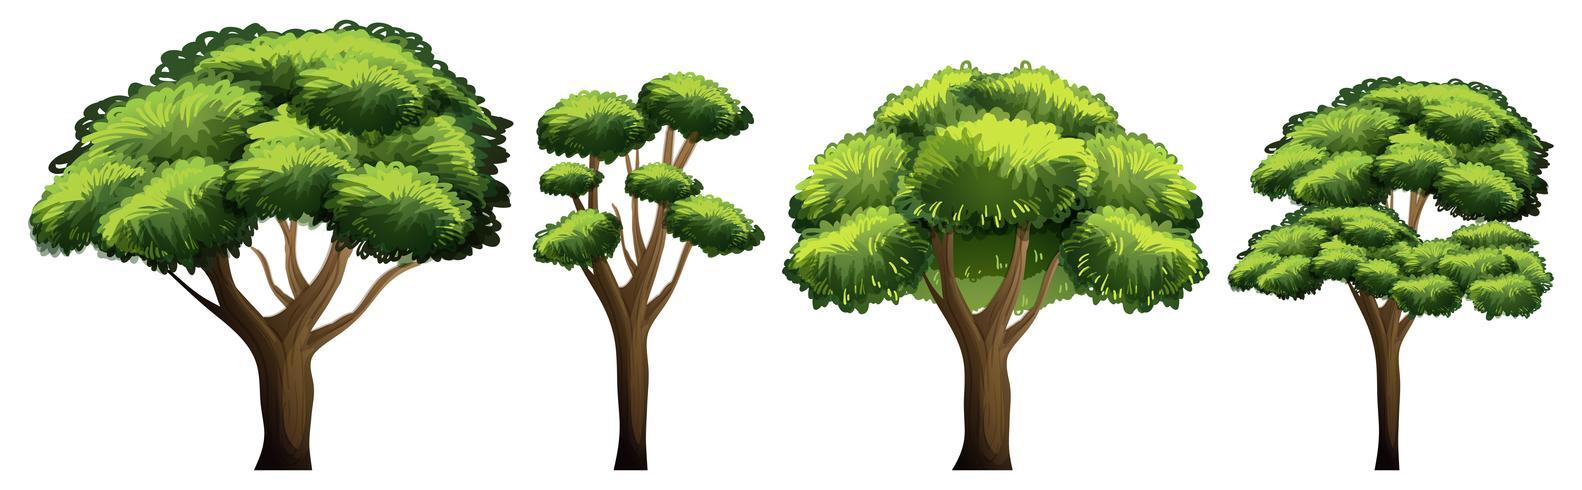 Set of different tree